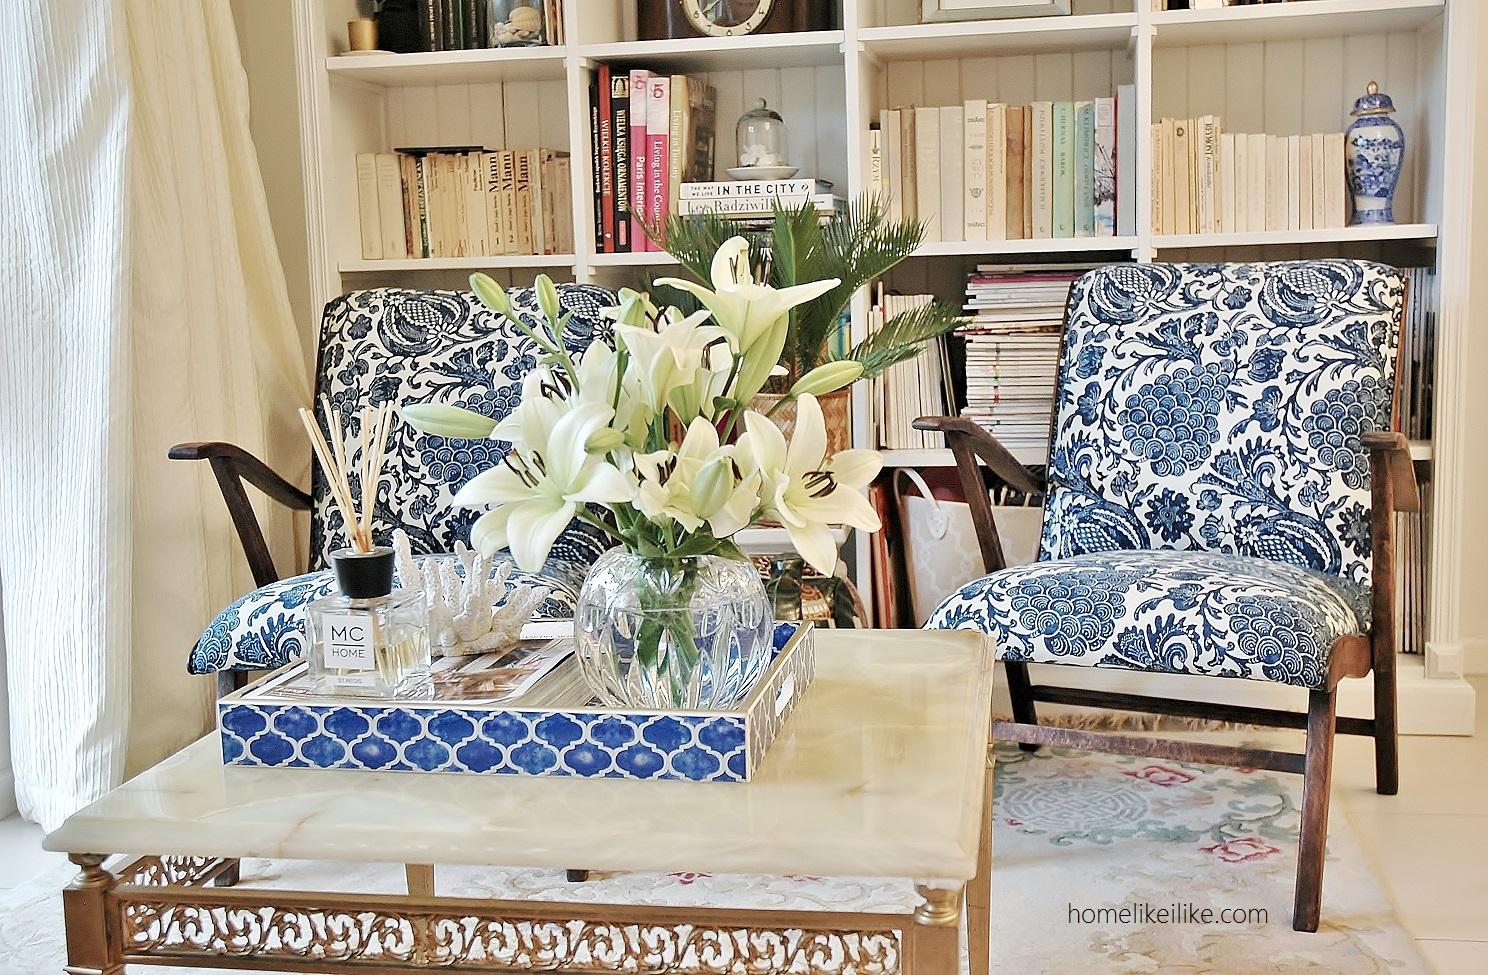 moje foteliki - midcentury armchairs - homelikeilike.com